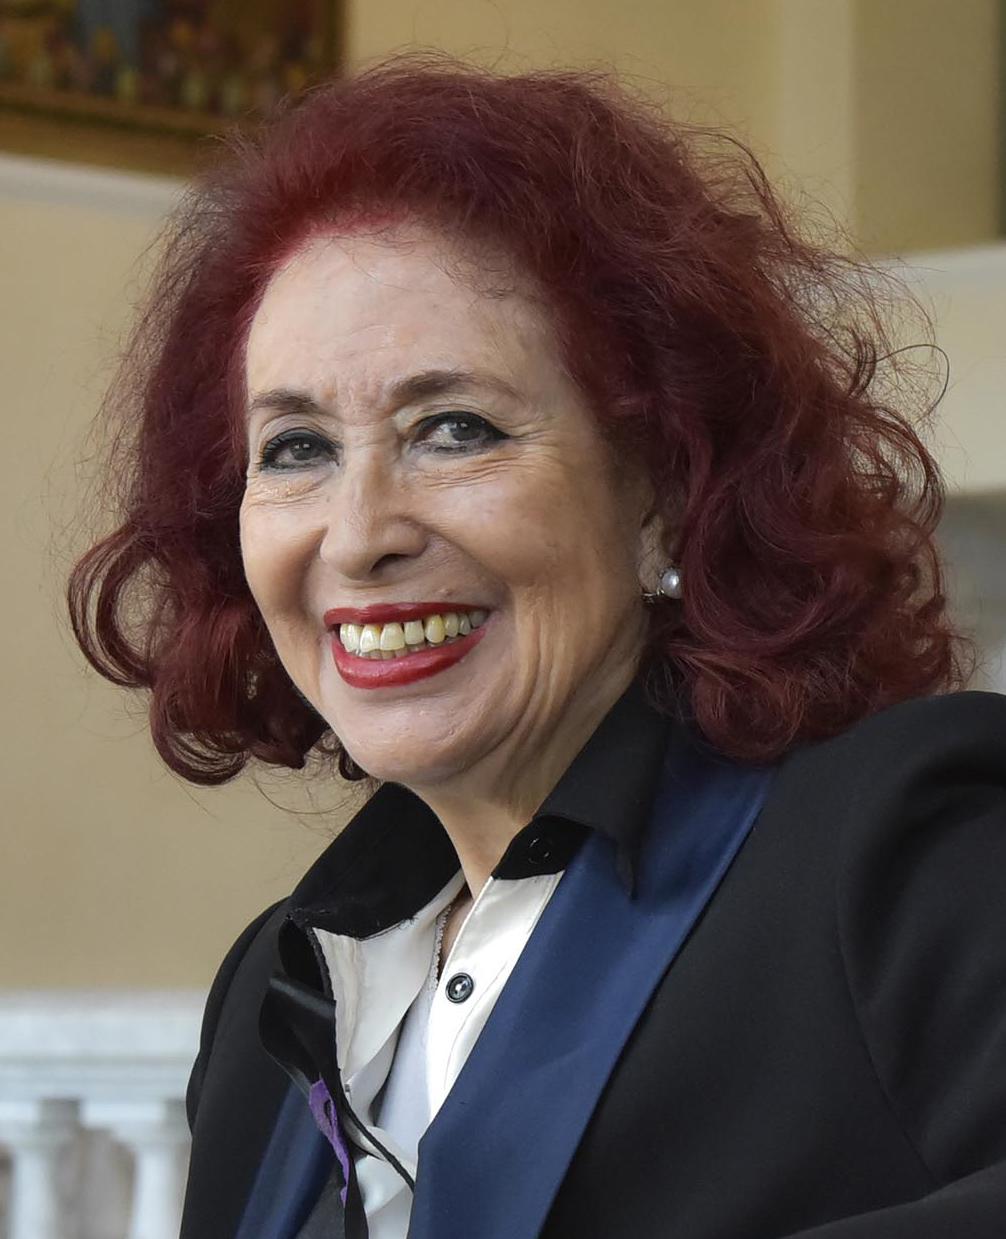 Lidia Falcón in 2019